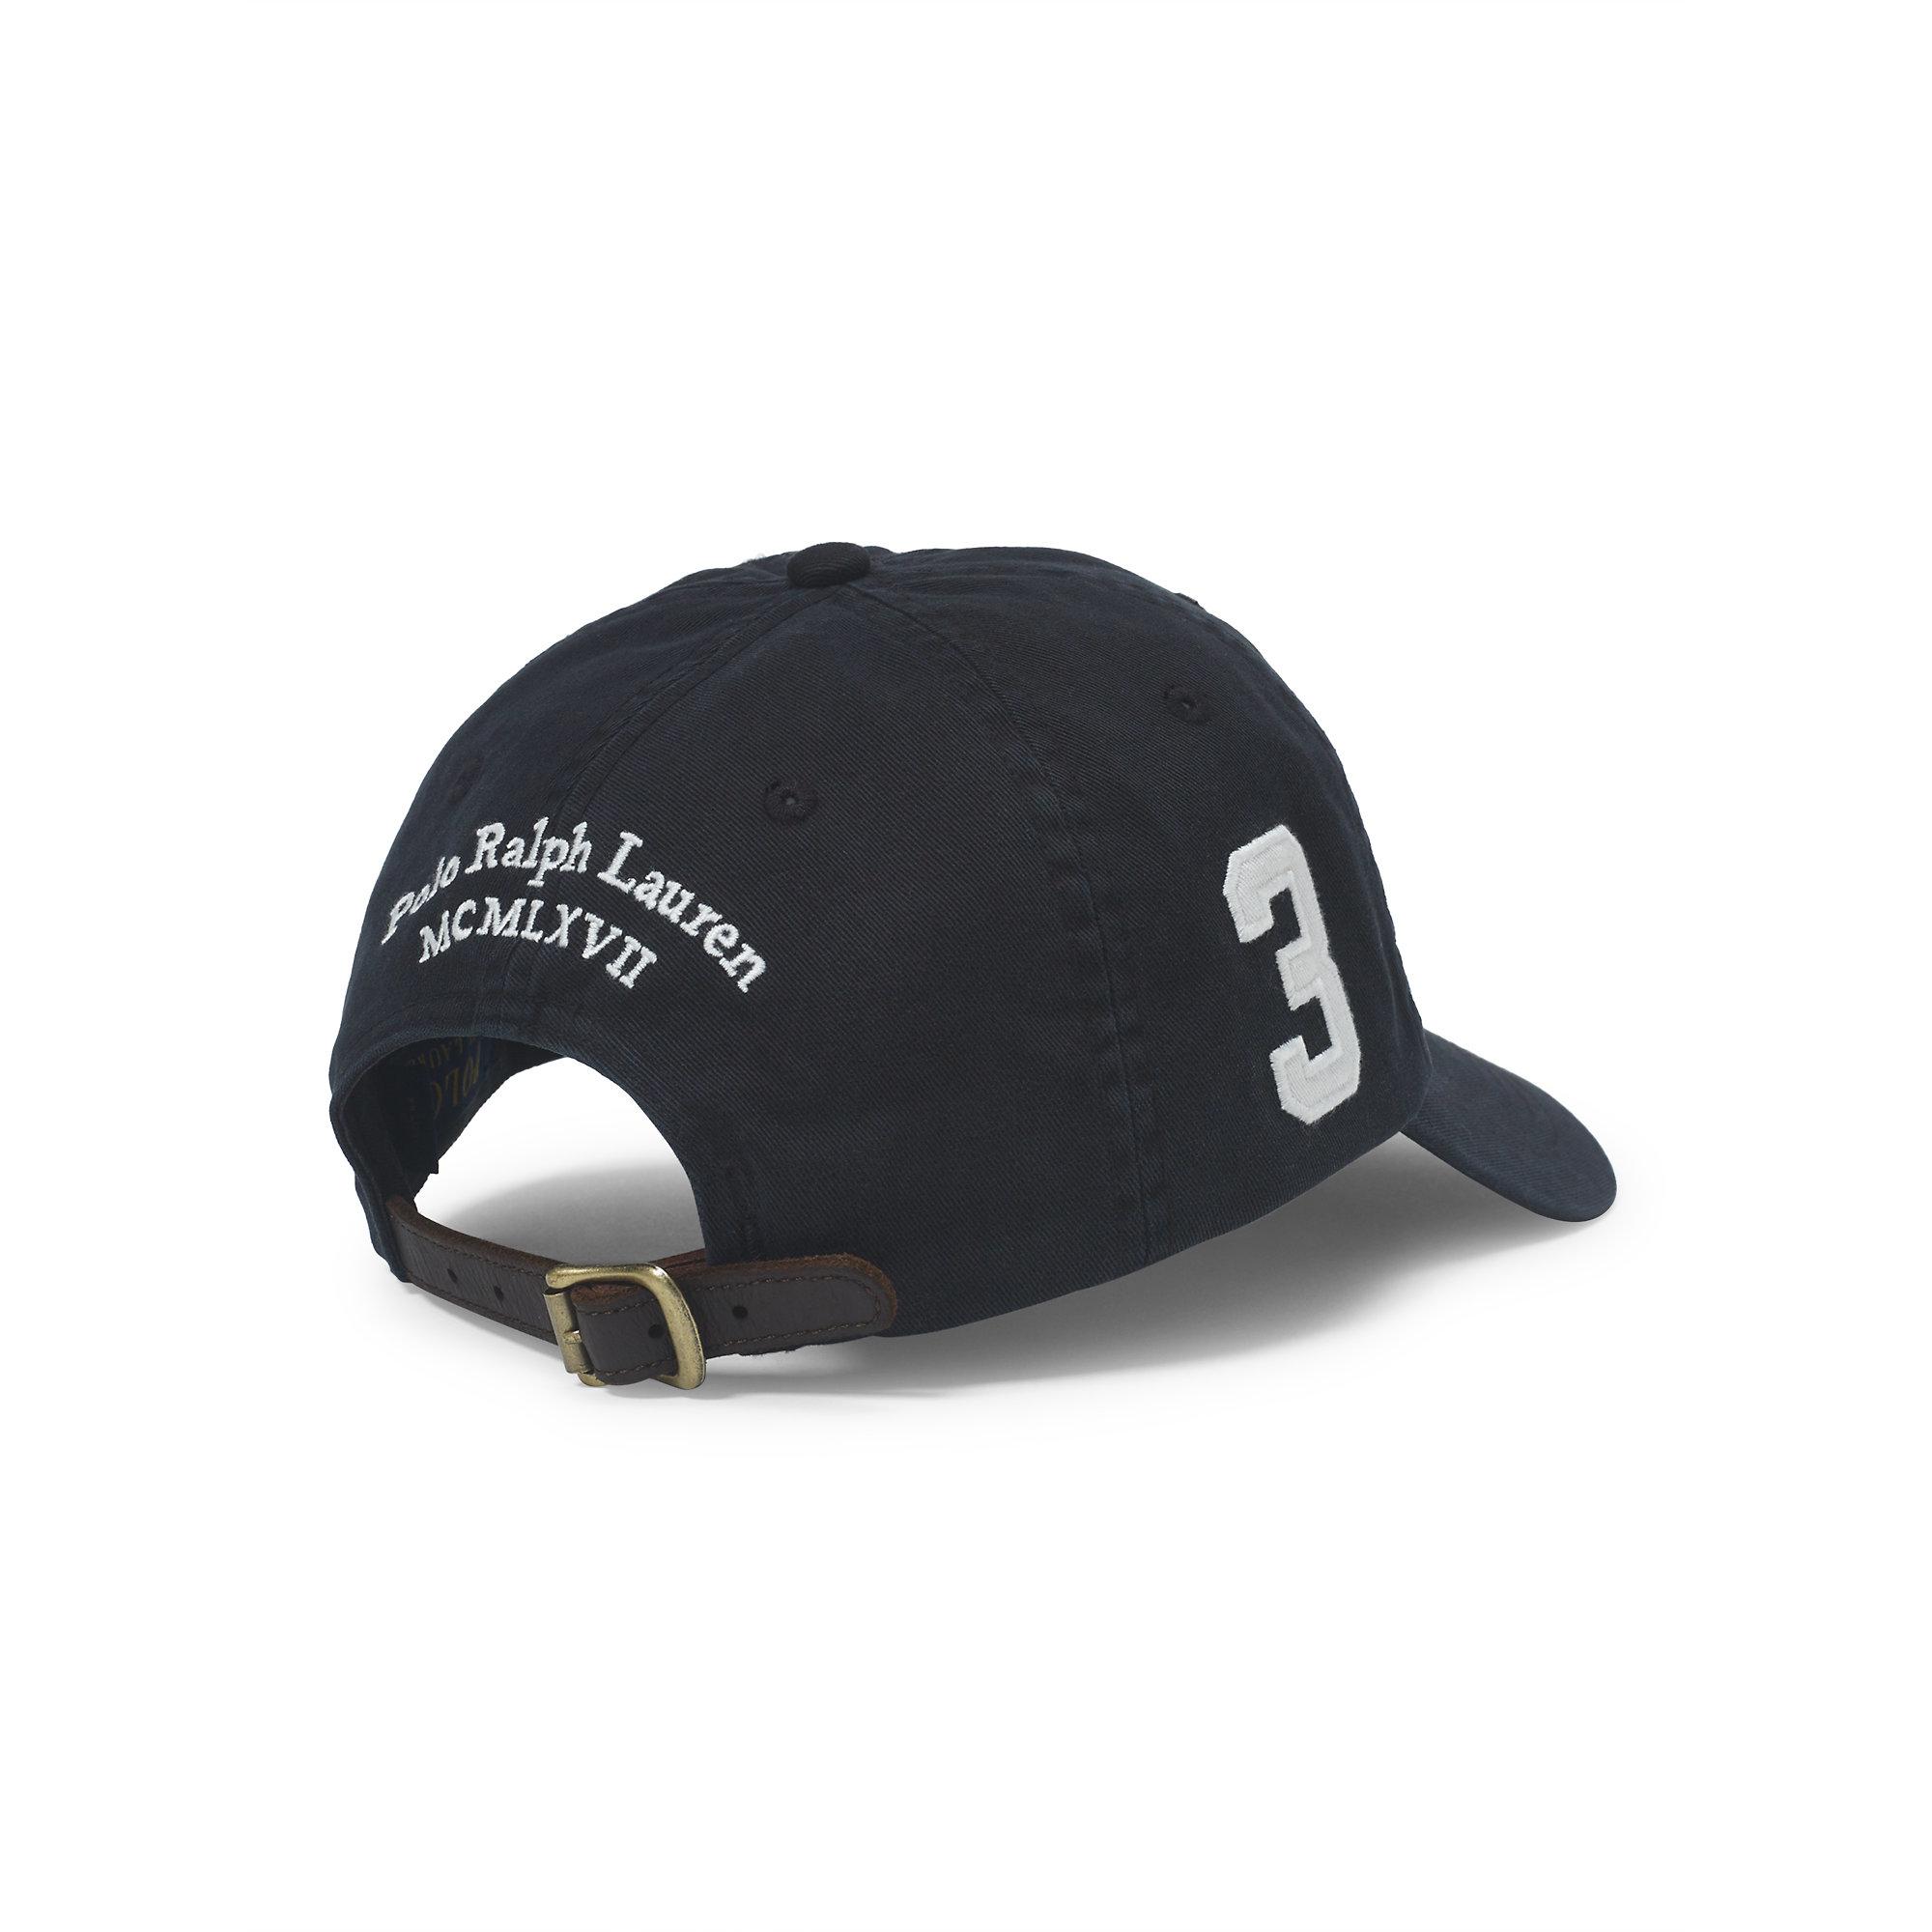 Lyst - Polo Ralph Lauren Big Pony Chino Baseball Cap in Black for Men 07fbfafc404